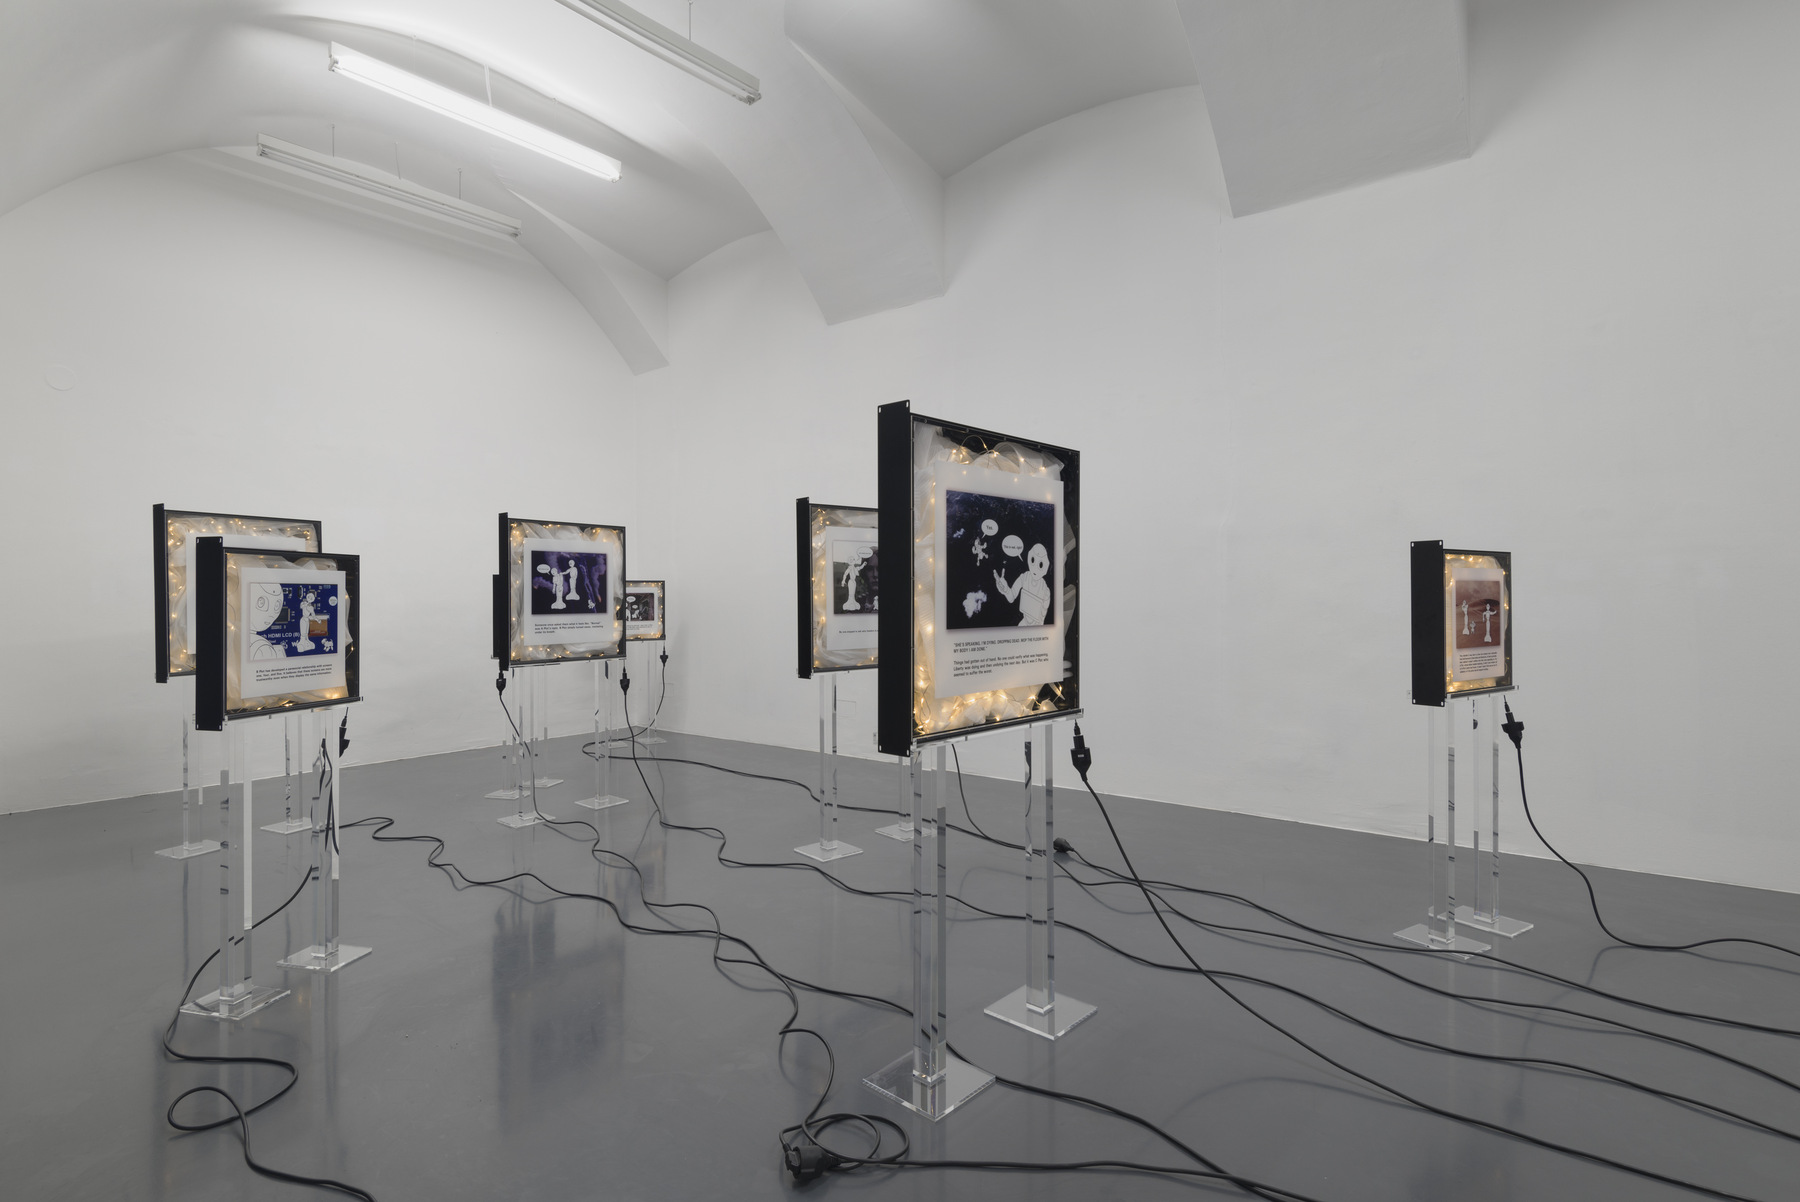 12_Cécile B. Evans_Galerie Emanuel Layr Vienna